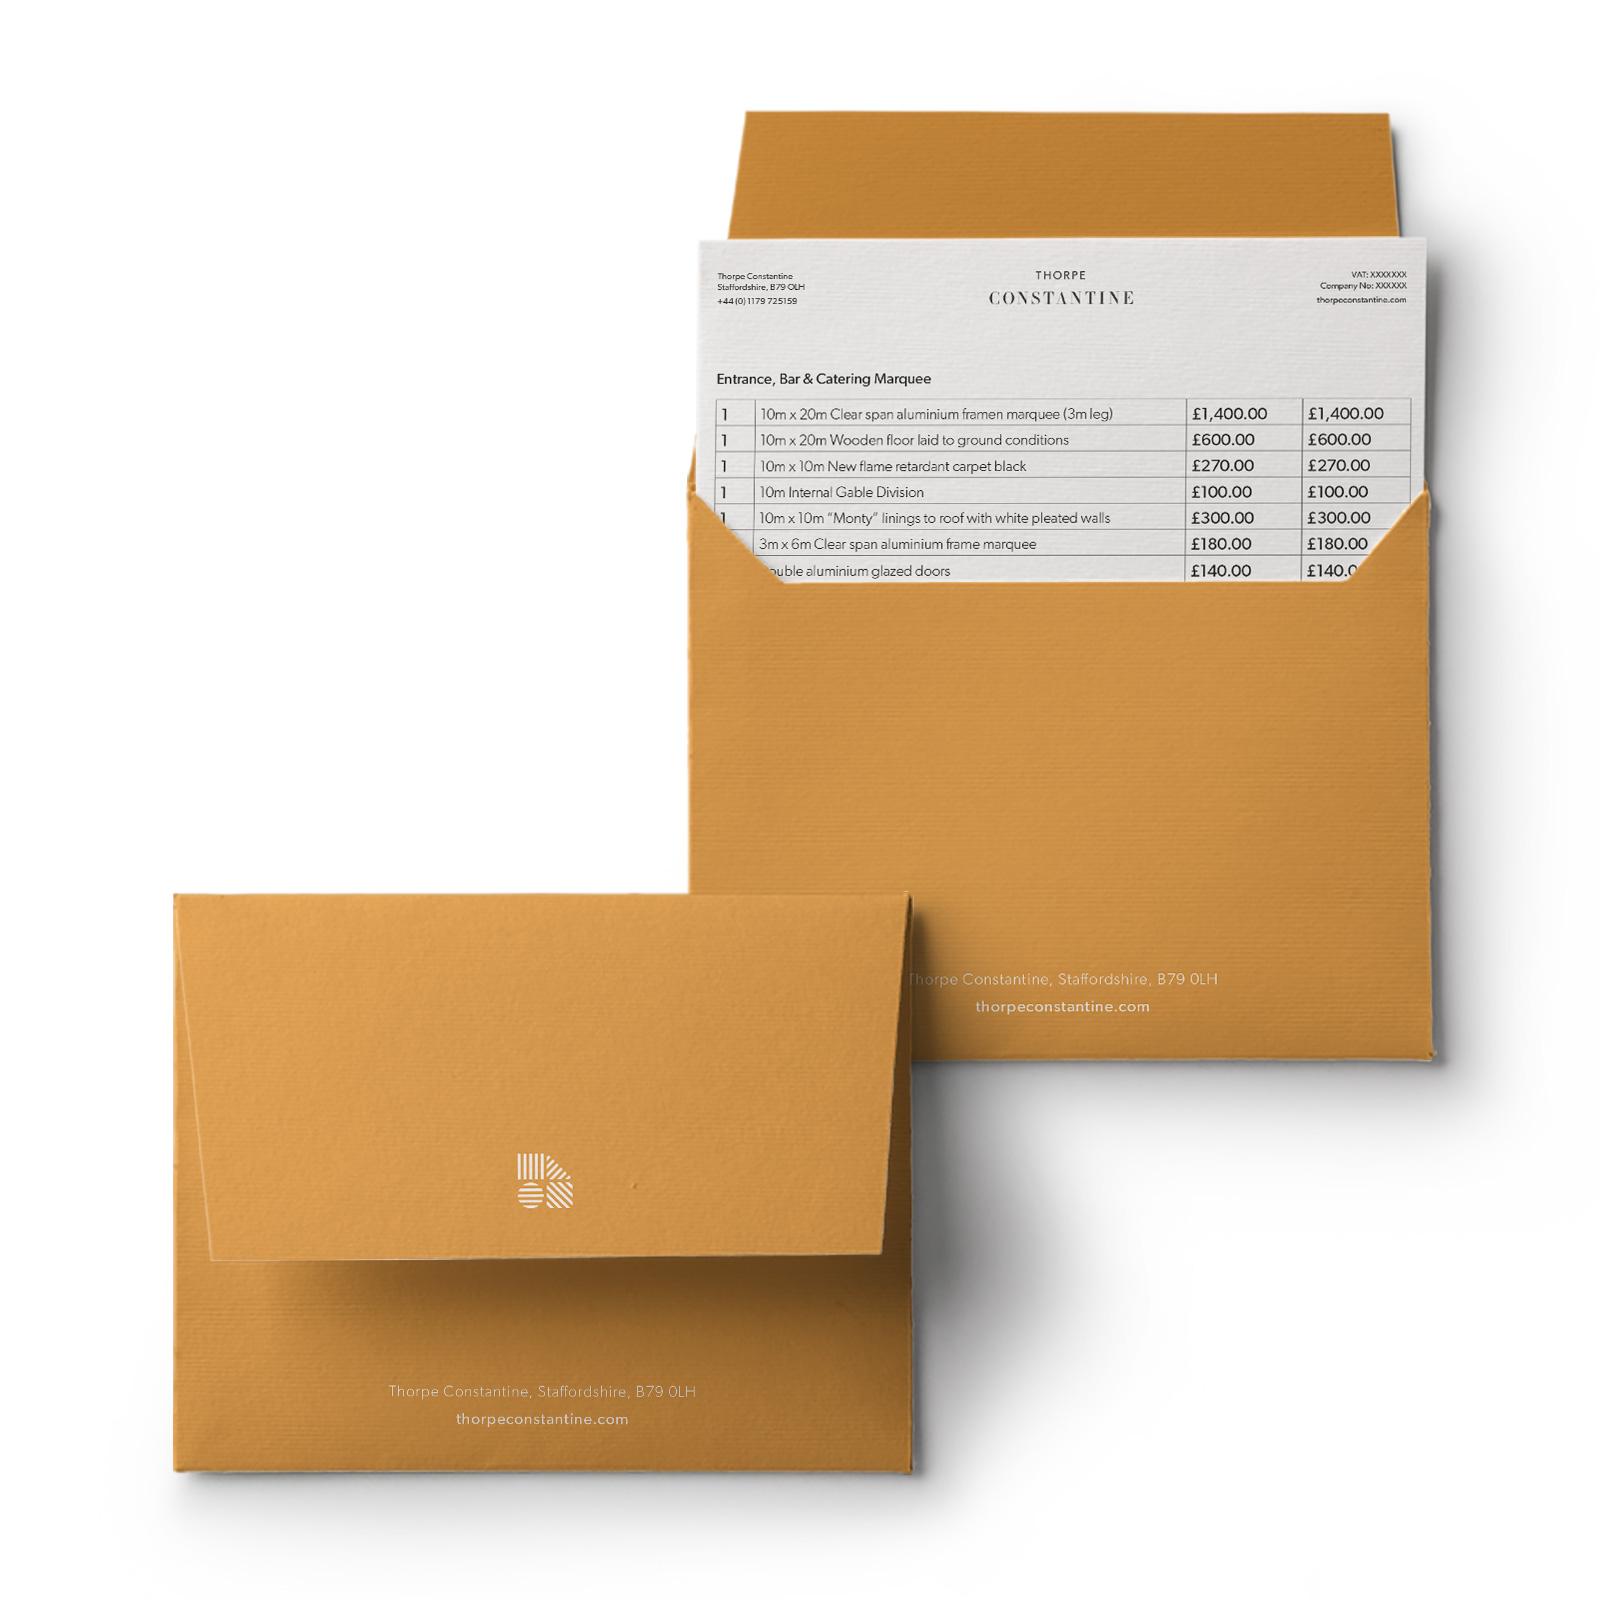 Thorpe Constantine Branding Envelope